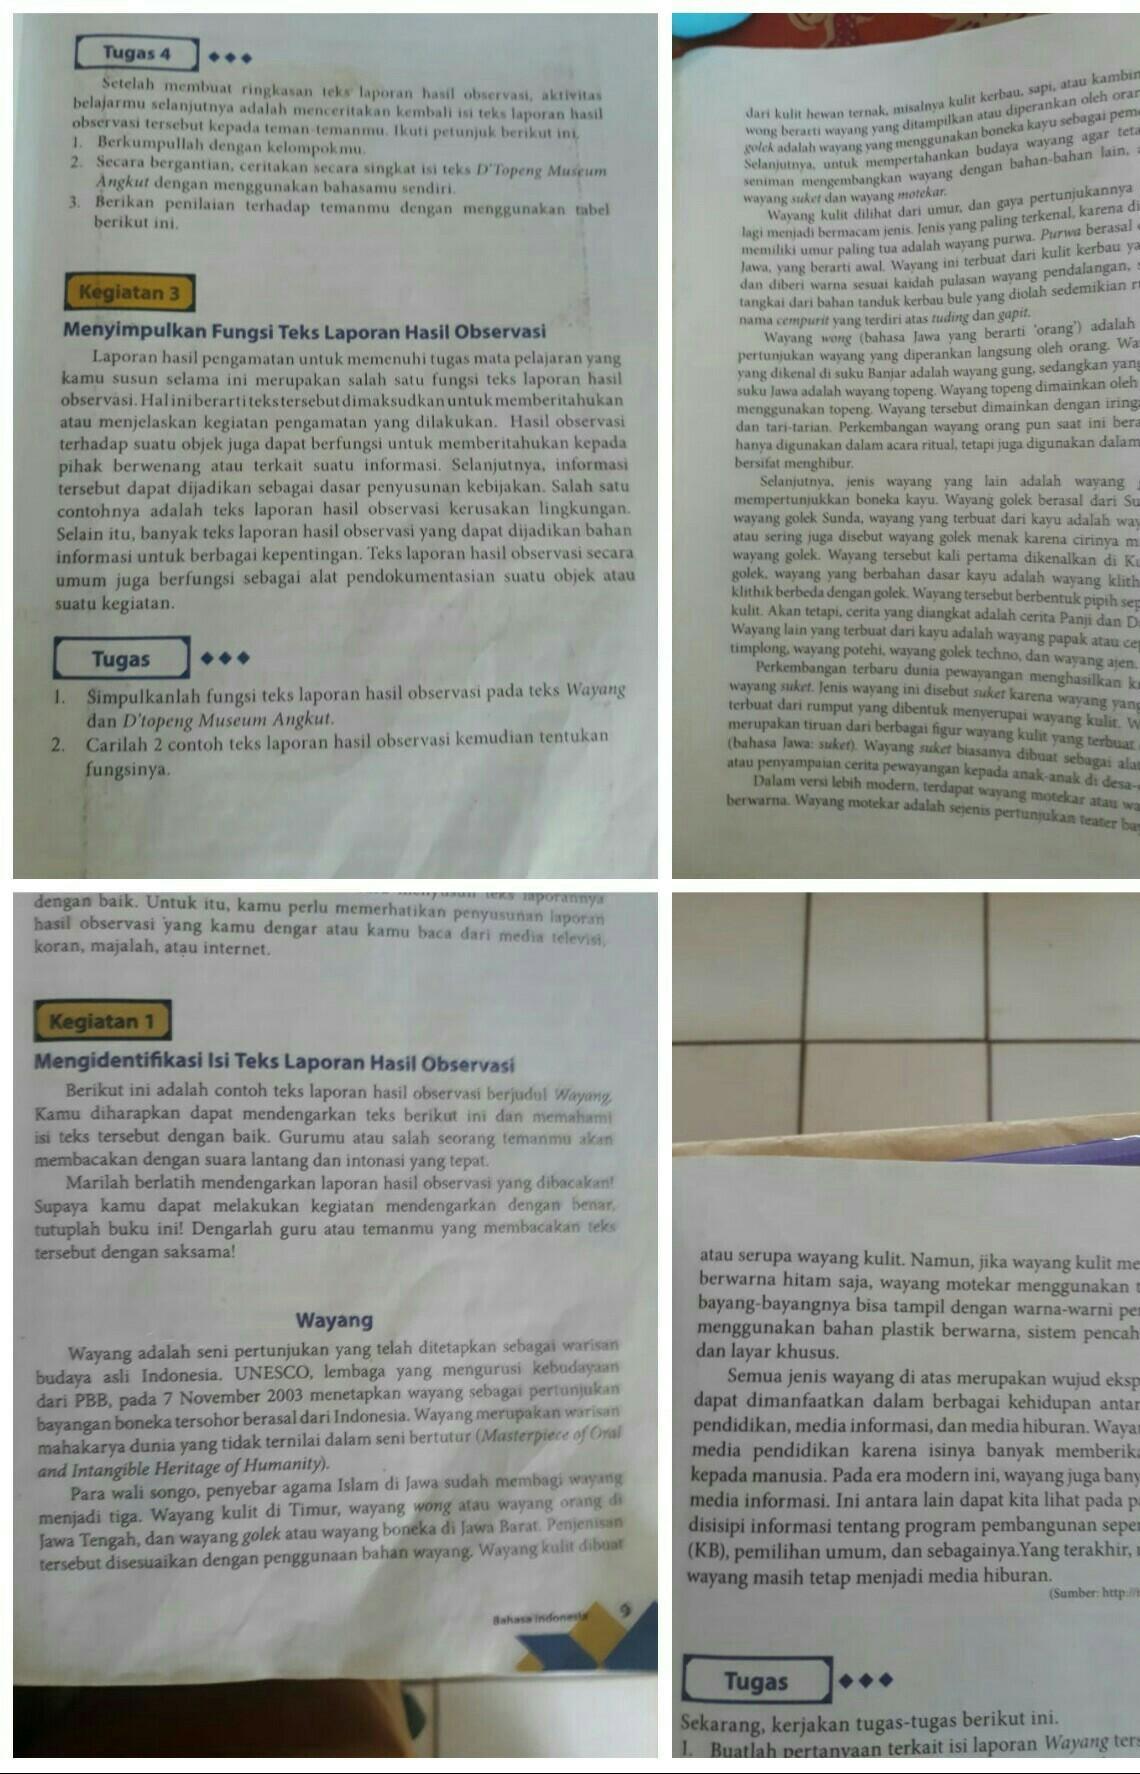 Baca Dan Simpulkan Teks Berikut Brainly Co Id